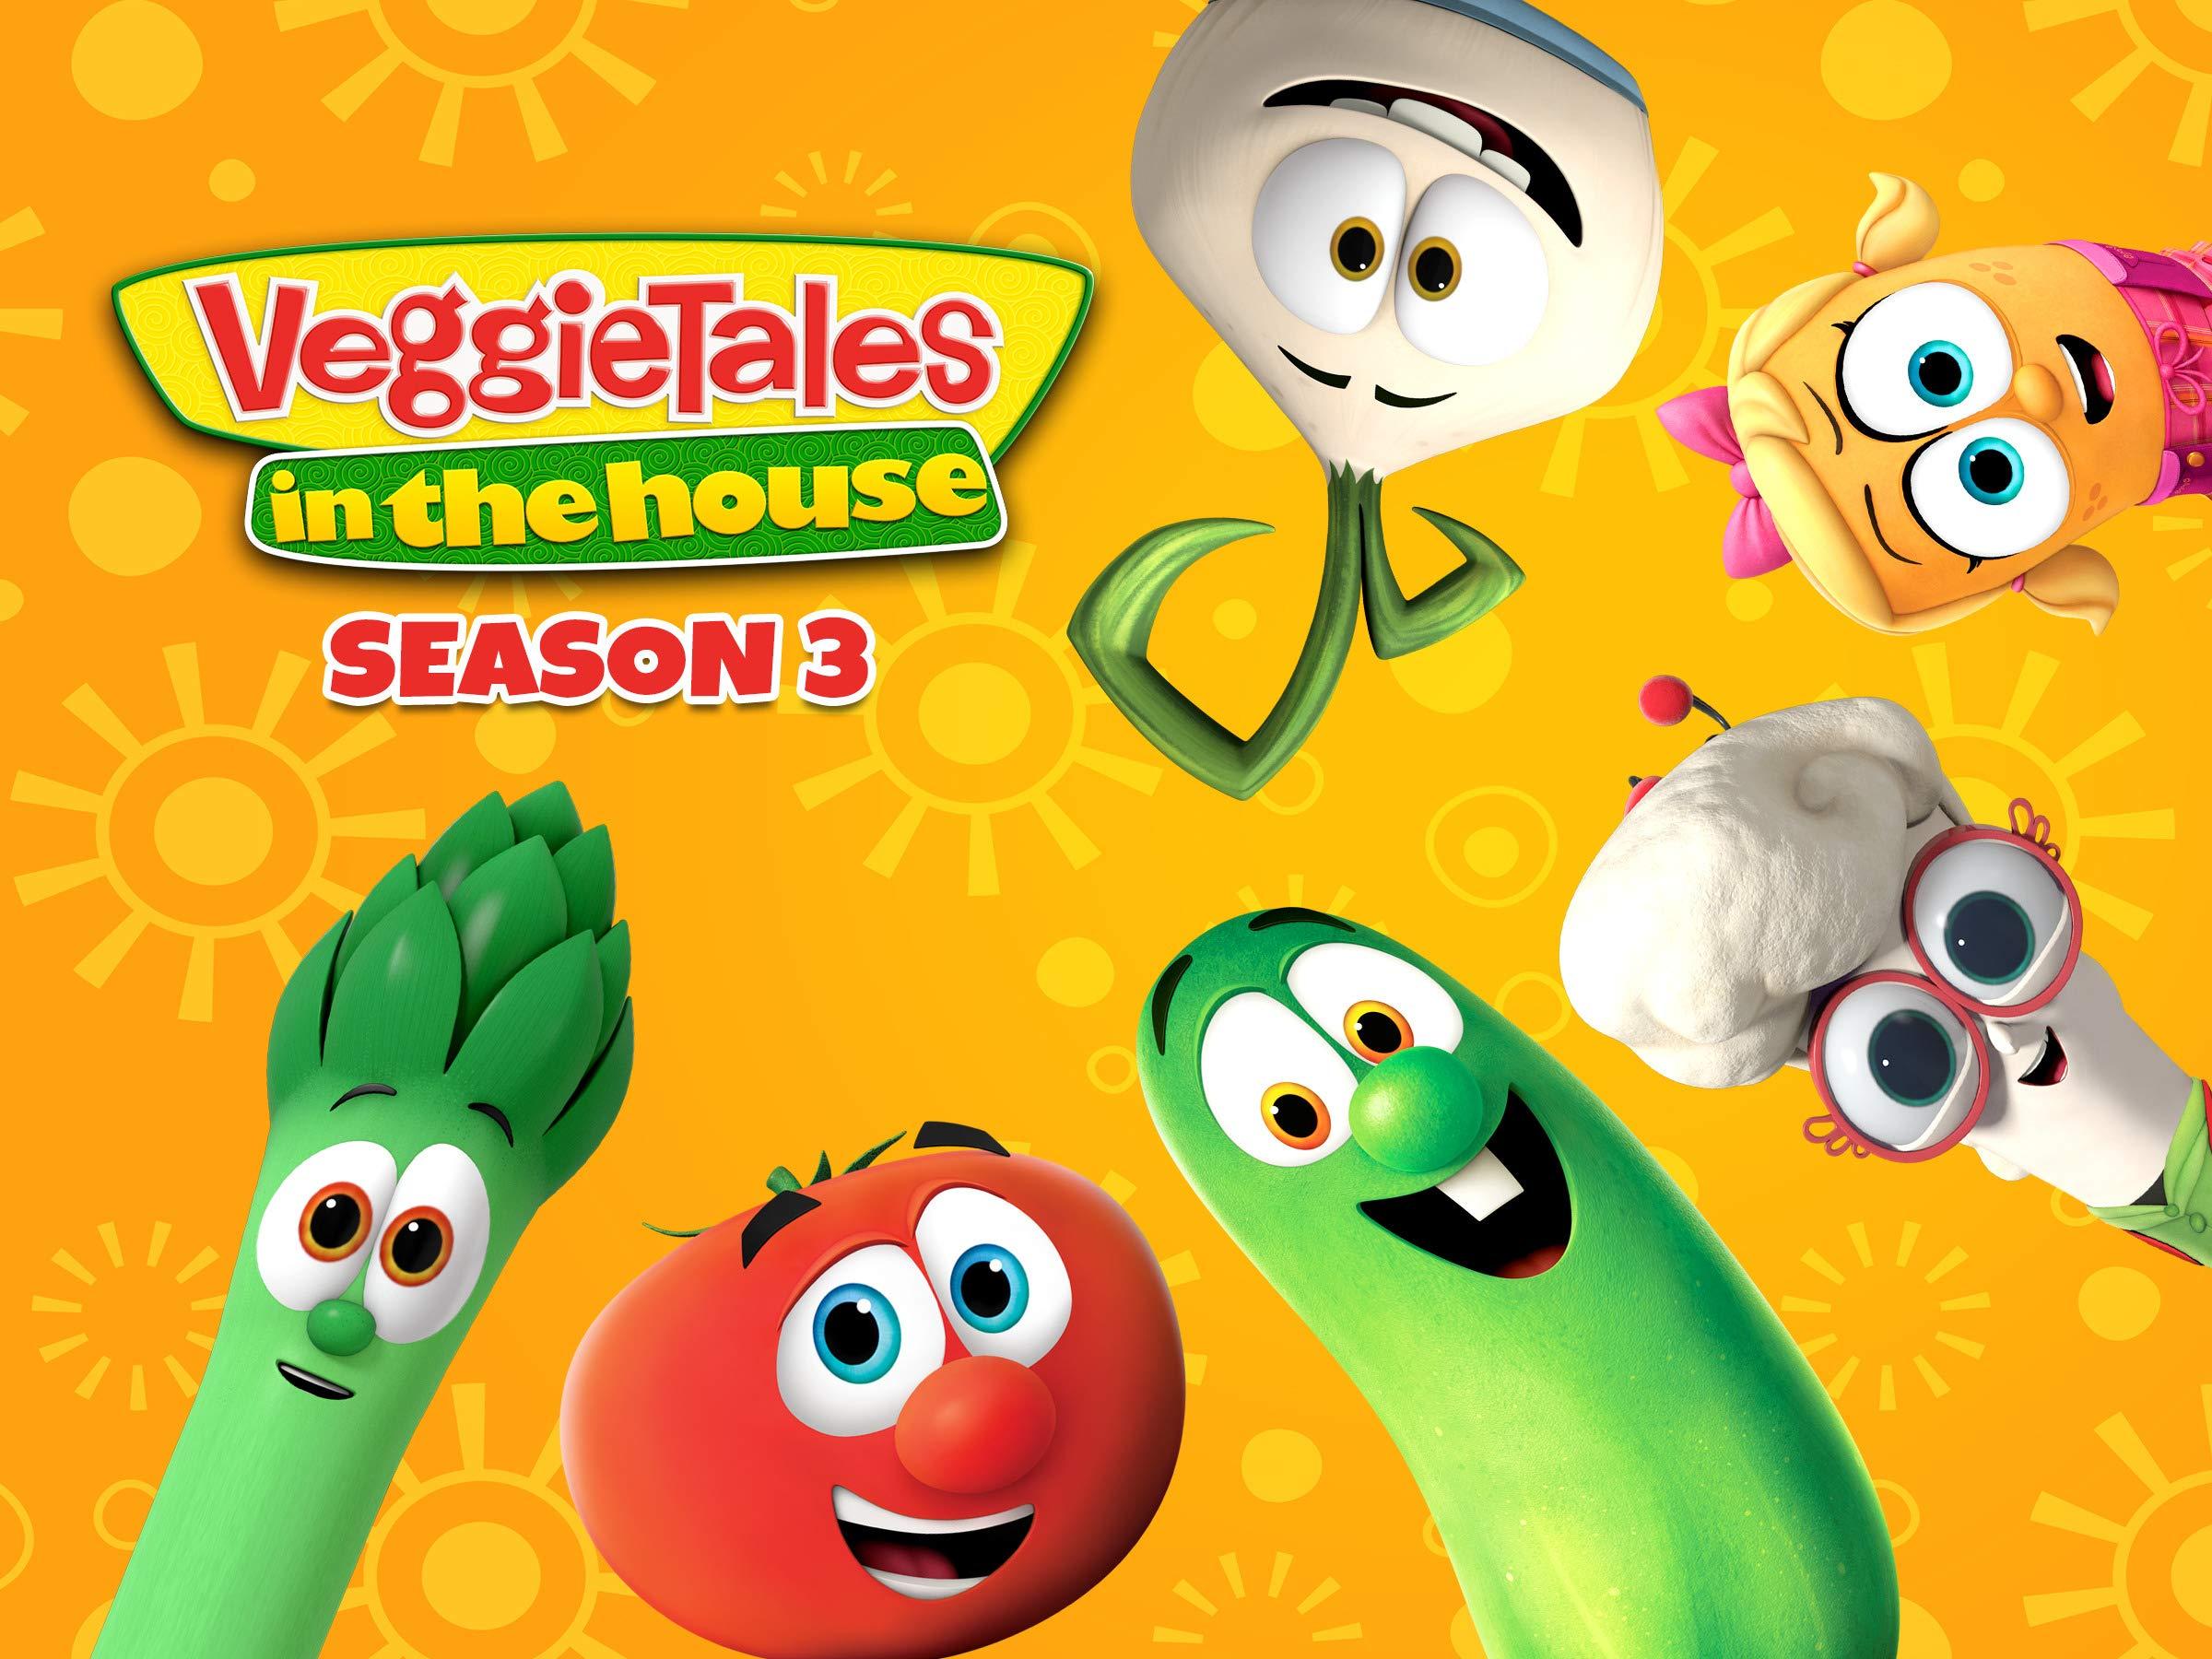 veggietales season 1 episode 8